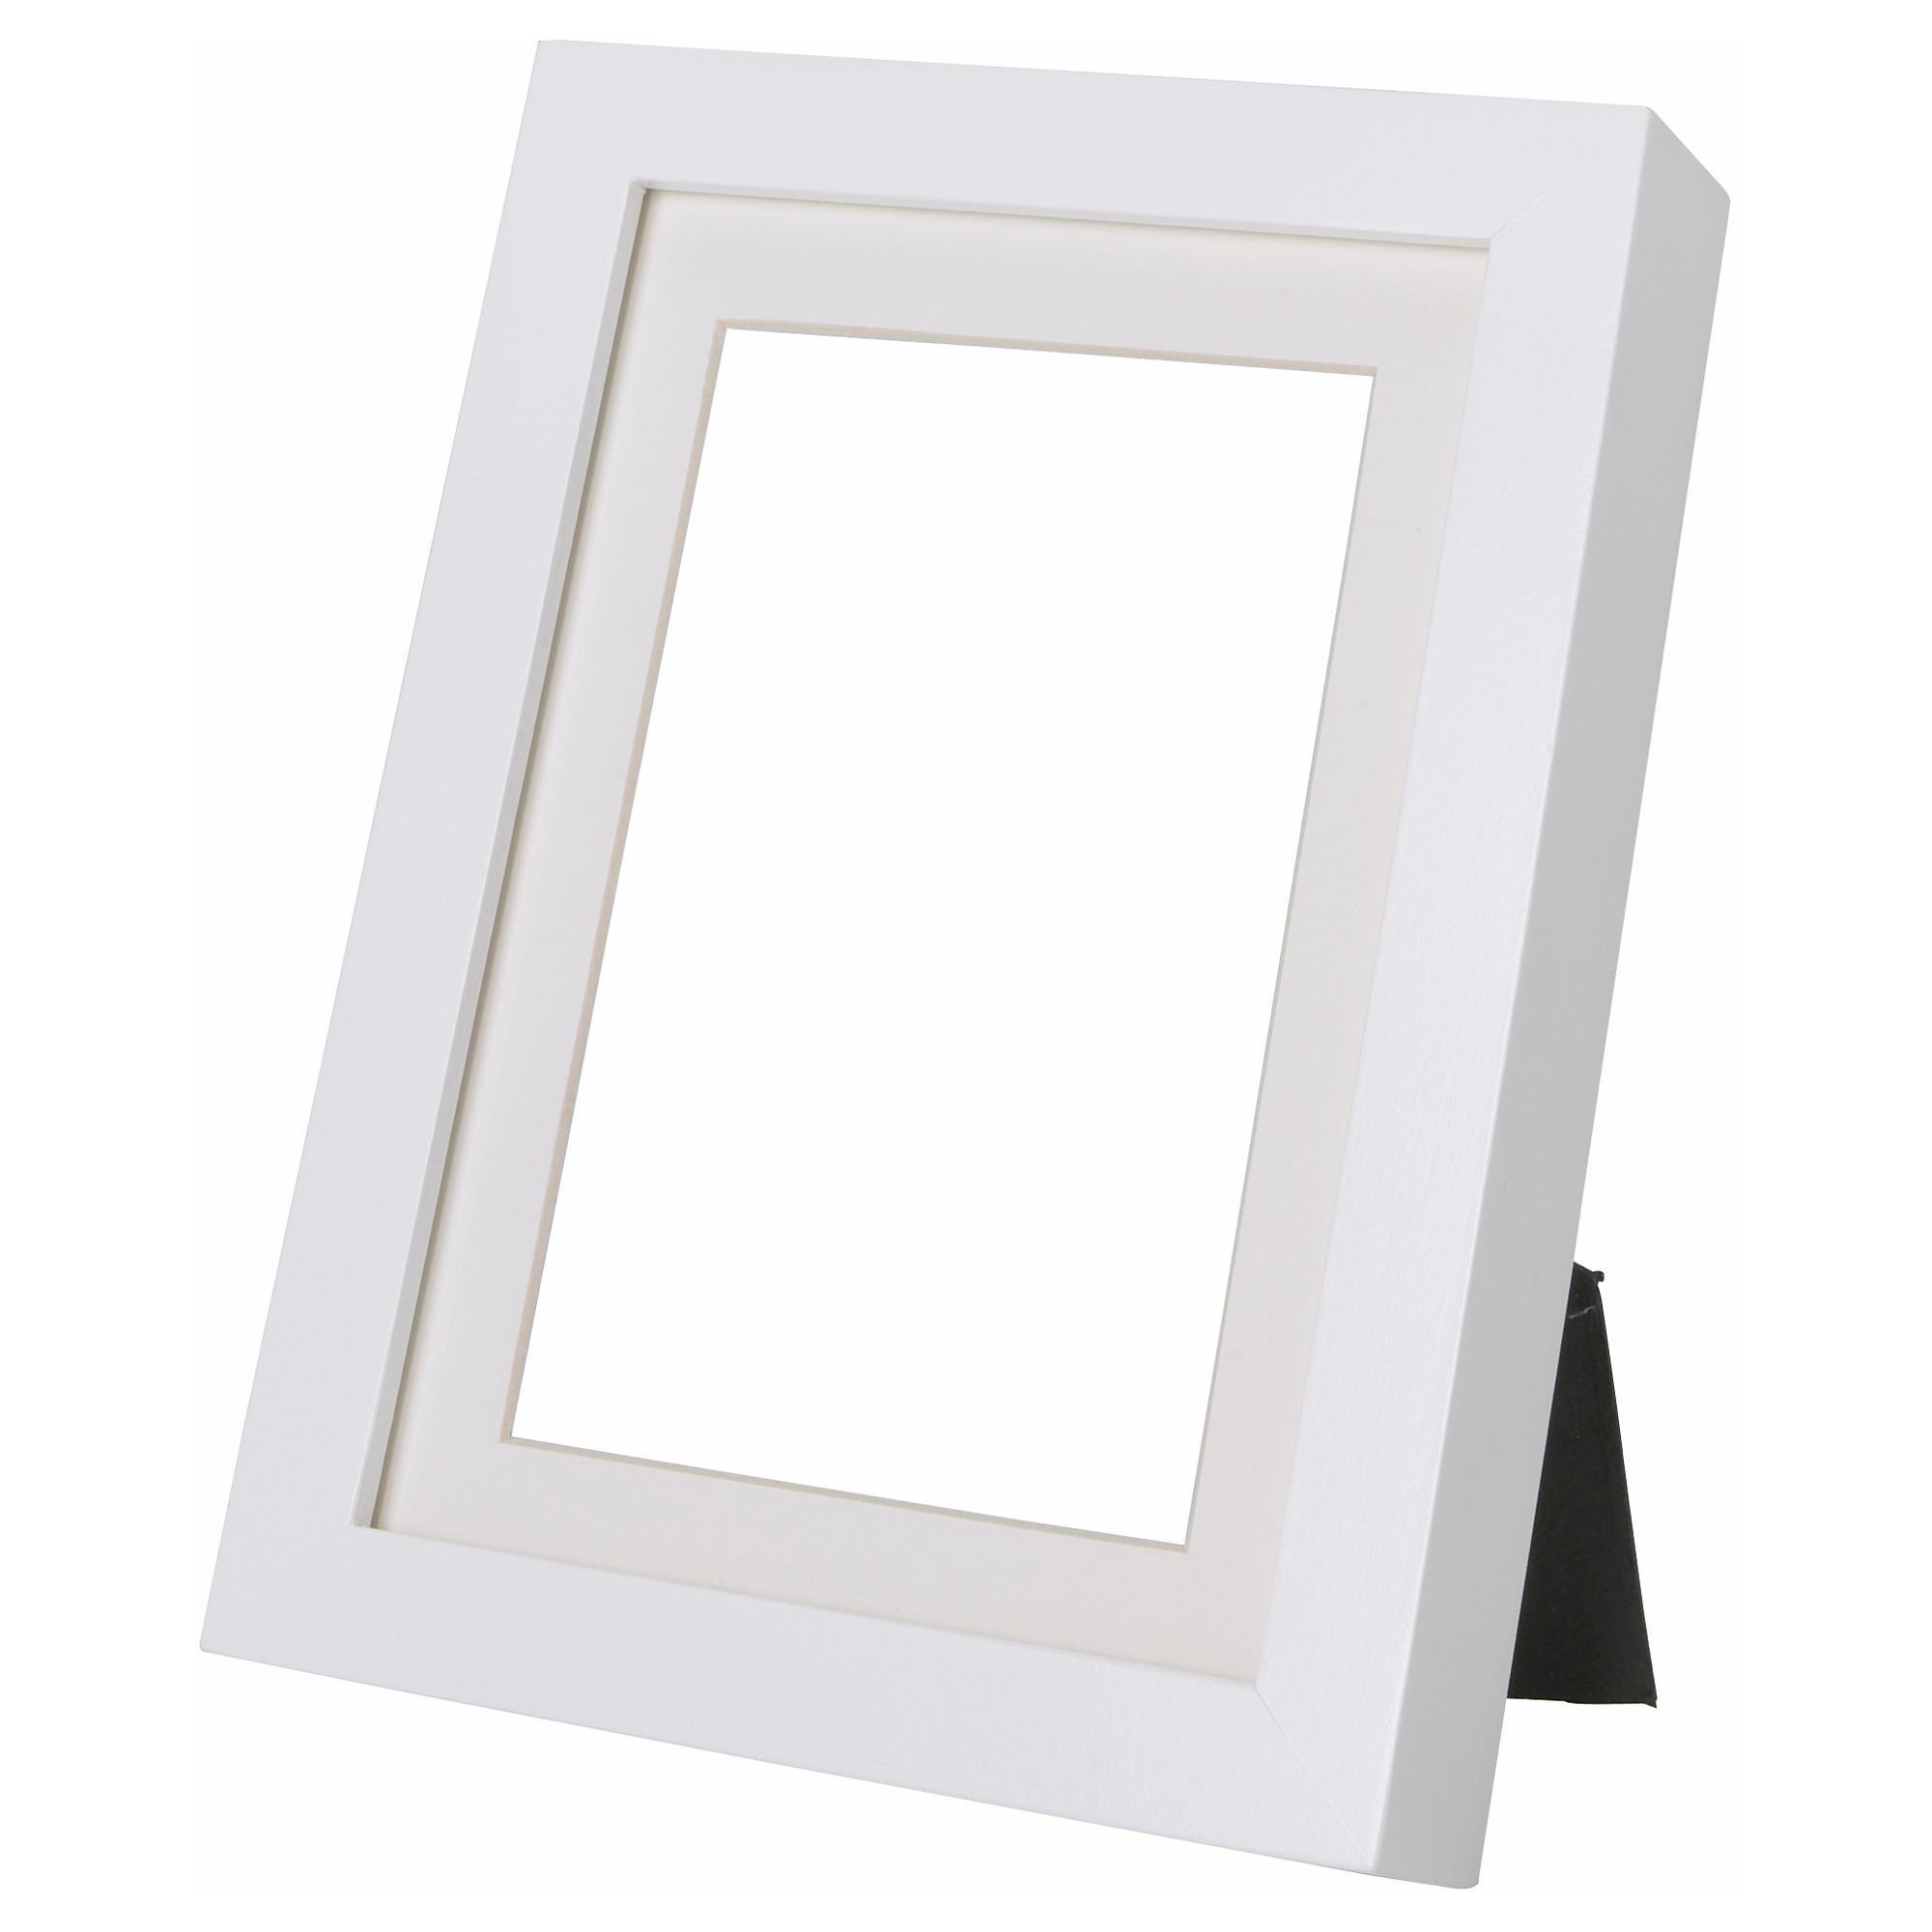 RIBBA frame